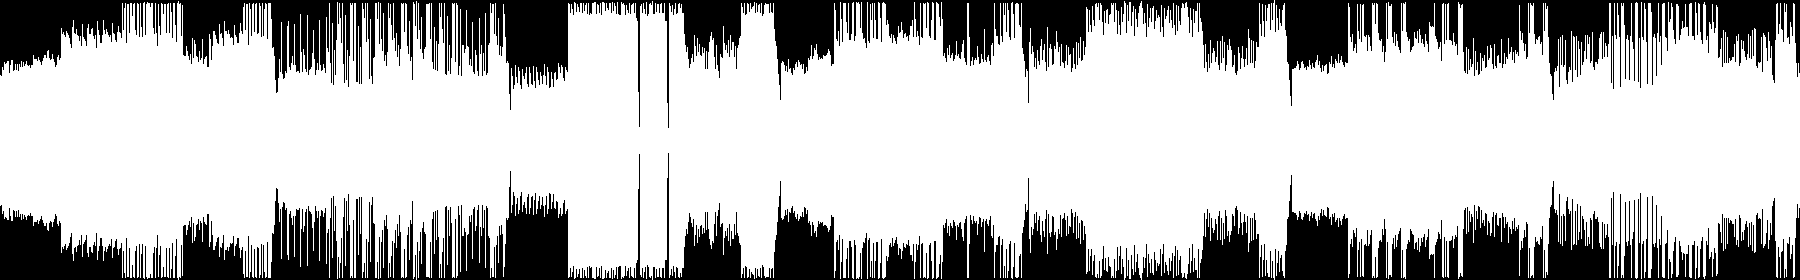 KHISUS audio waveform